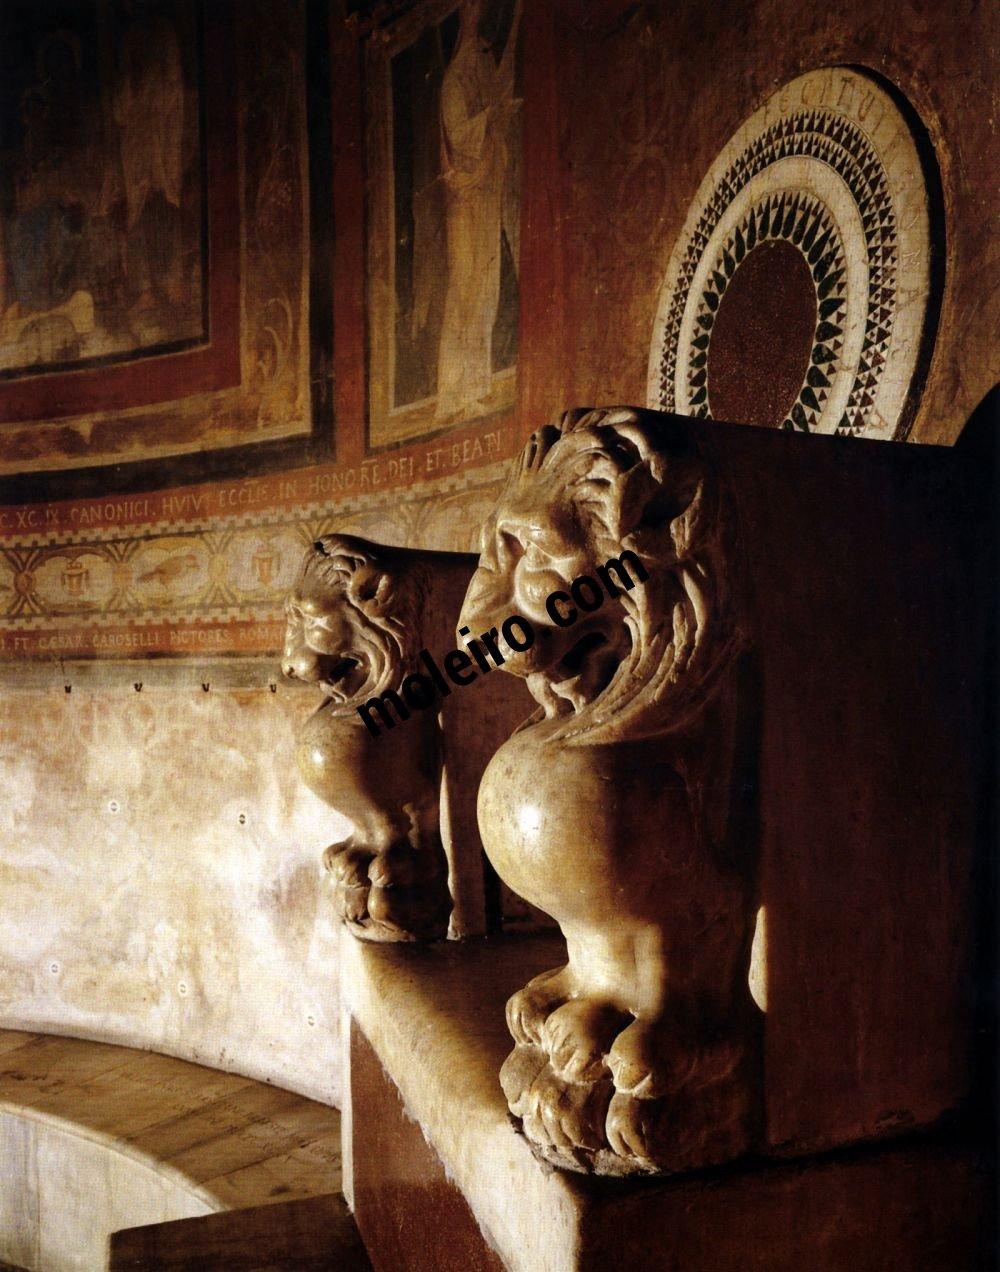 Iglesias de Roma Santa María in Cosmedin, trono pontificio, detalle, siglo VI.